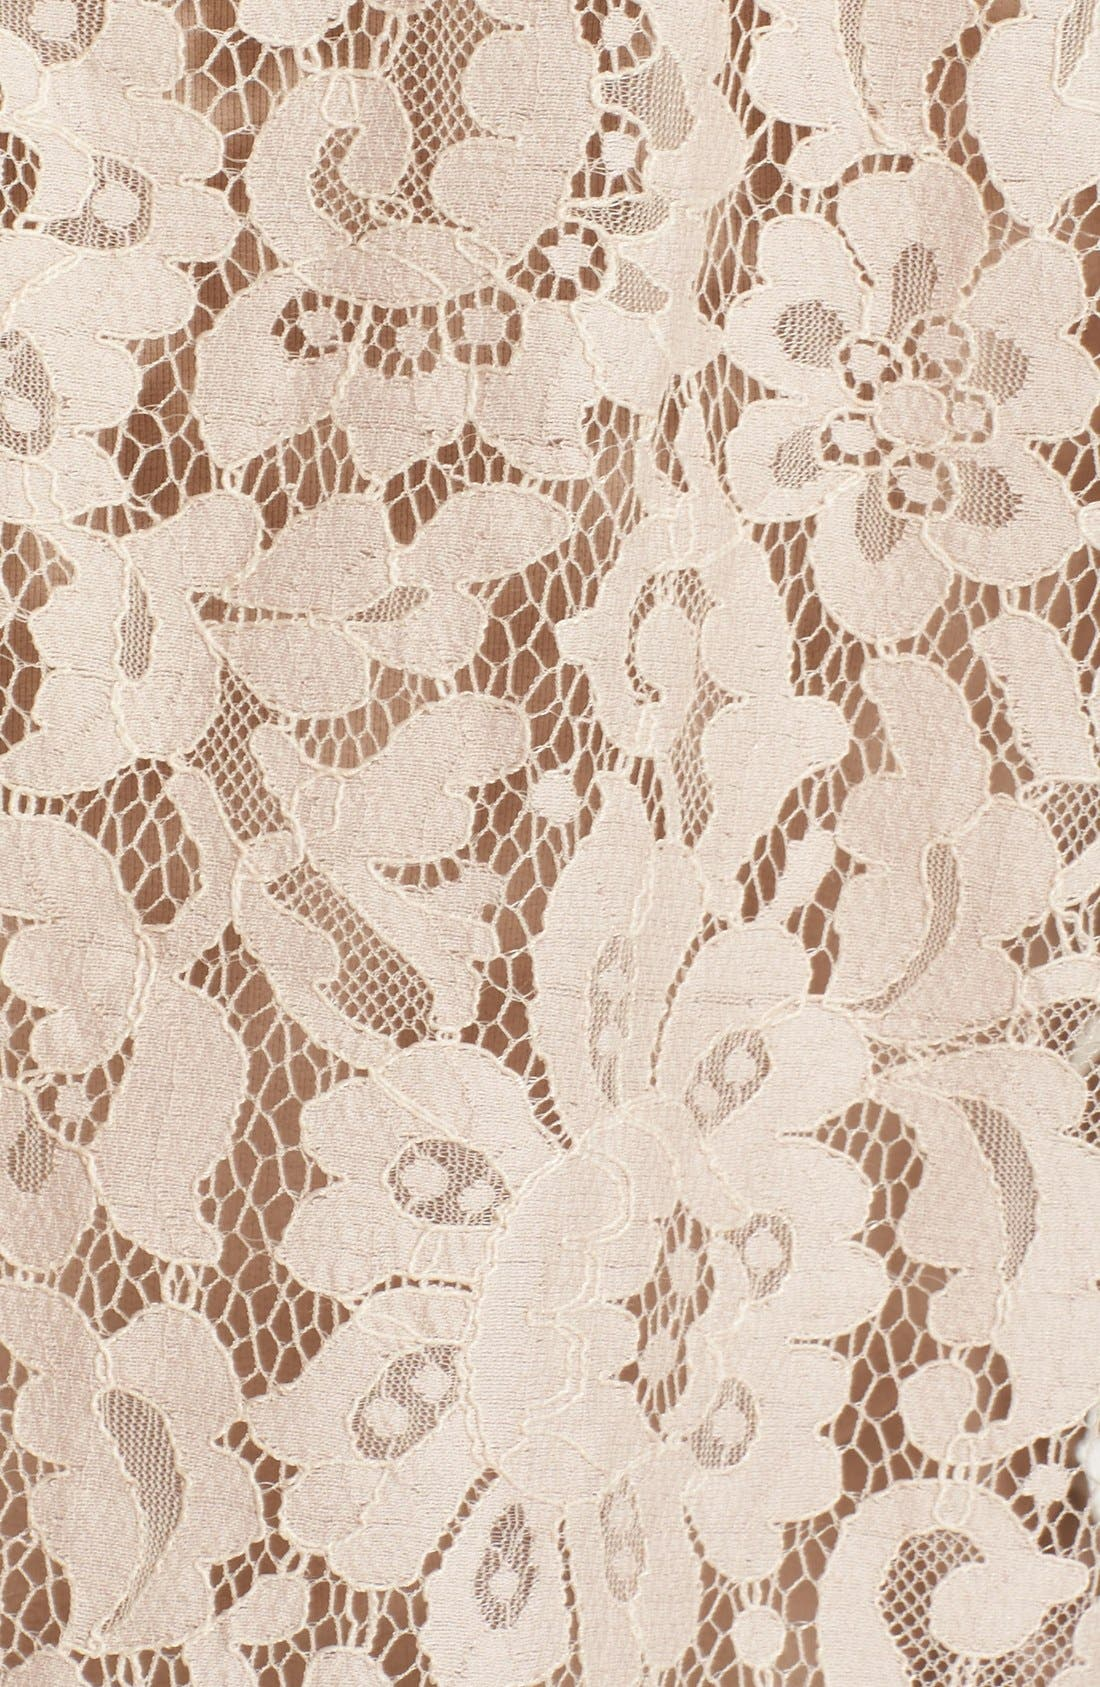 'Fanny' Sheer Lace Top,                             Alternate thumbnail 6, color,                             650